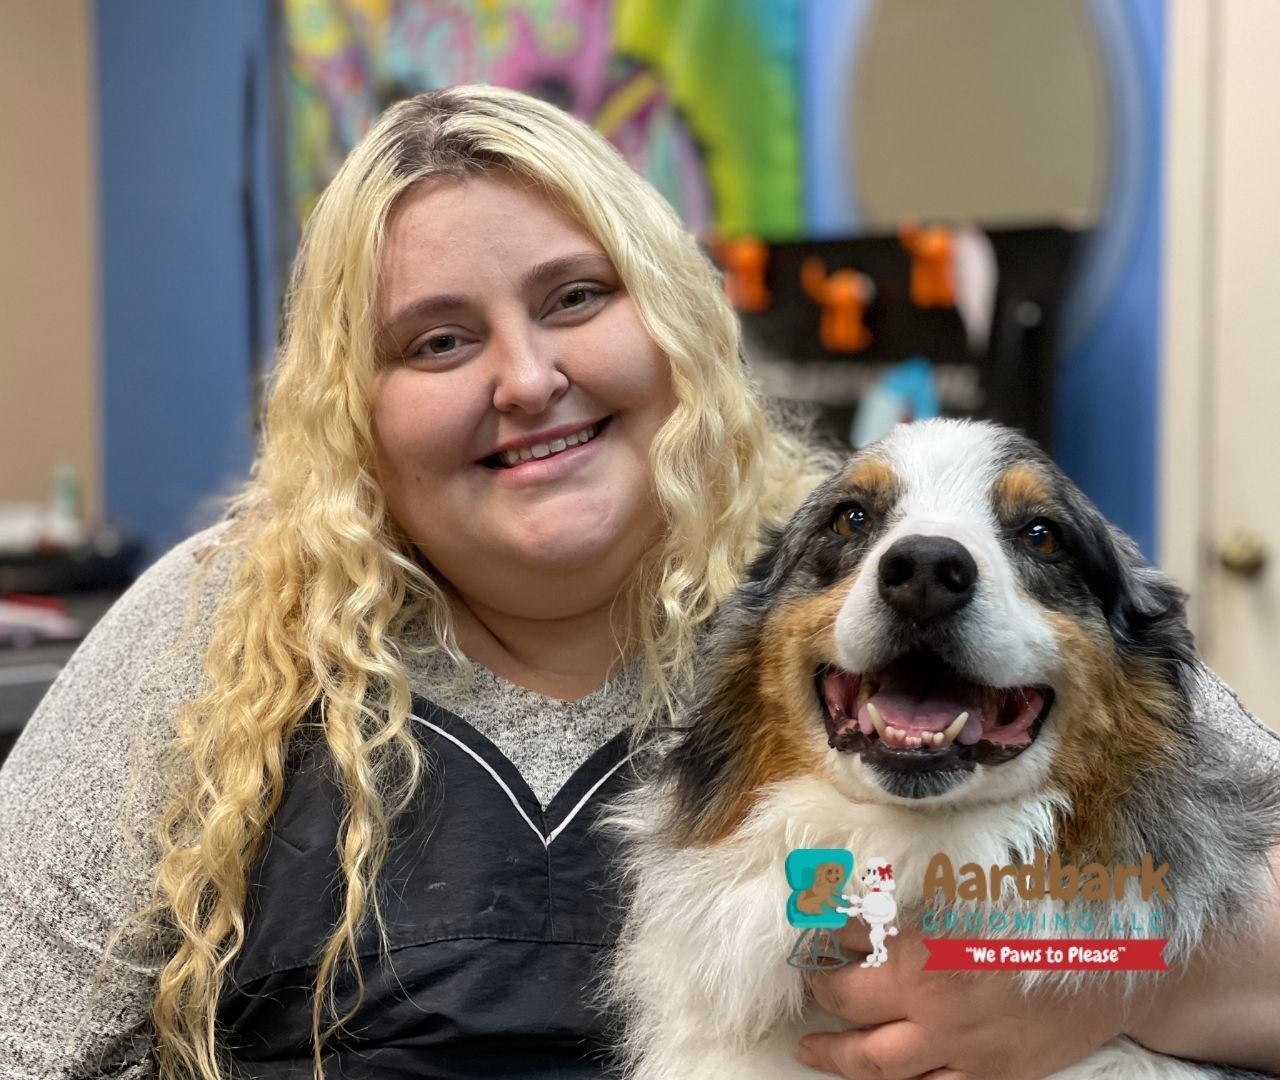 aardbark dog grooming staff member with groomed dog